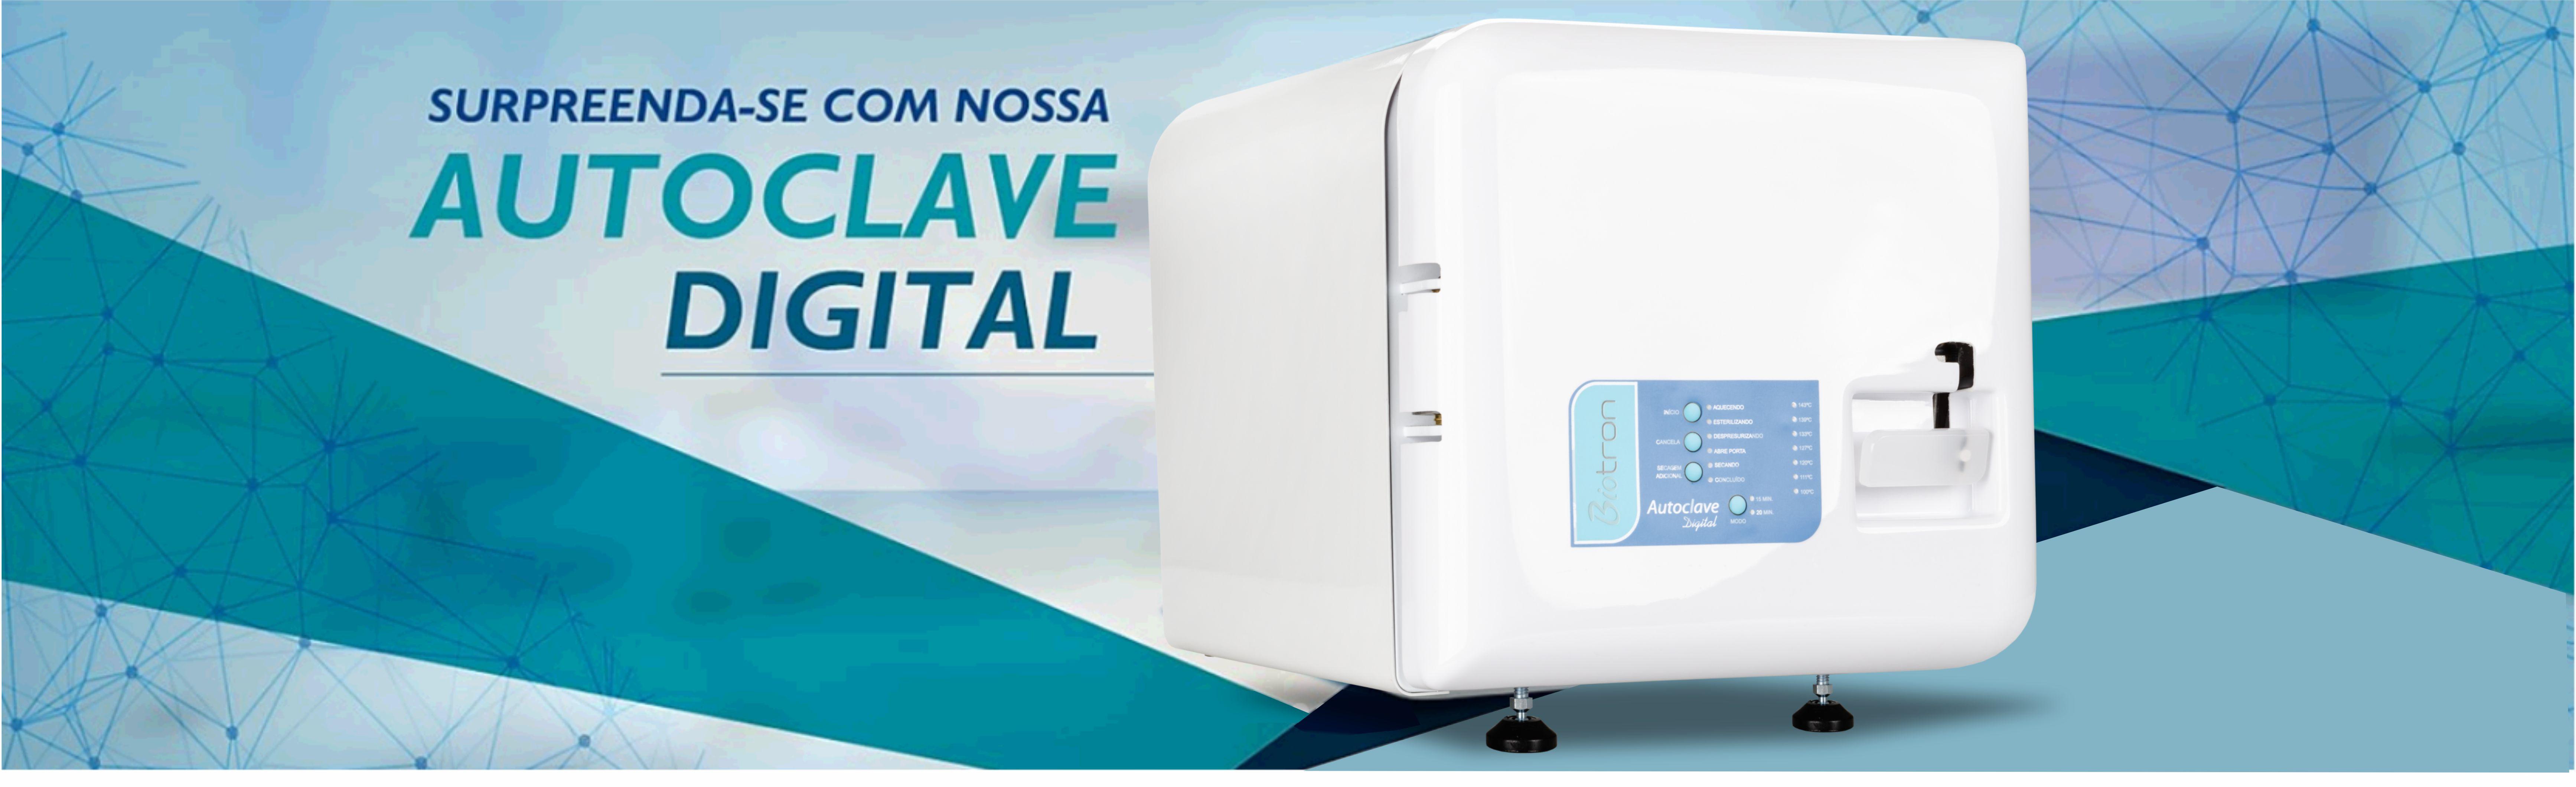 Autoclave digital